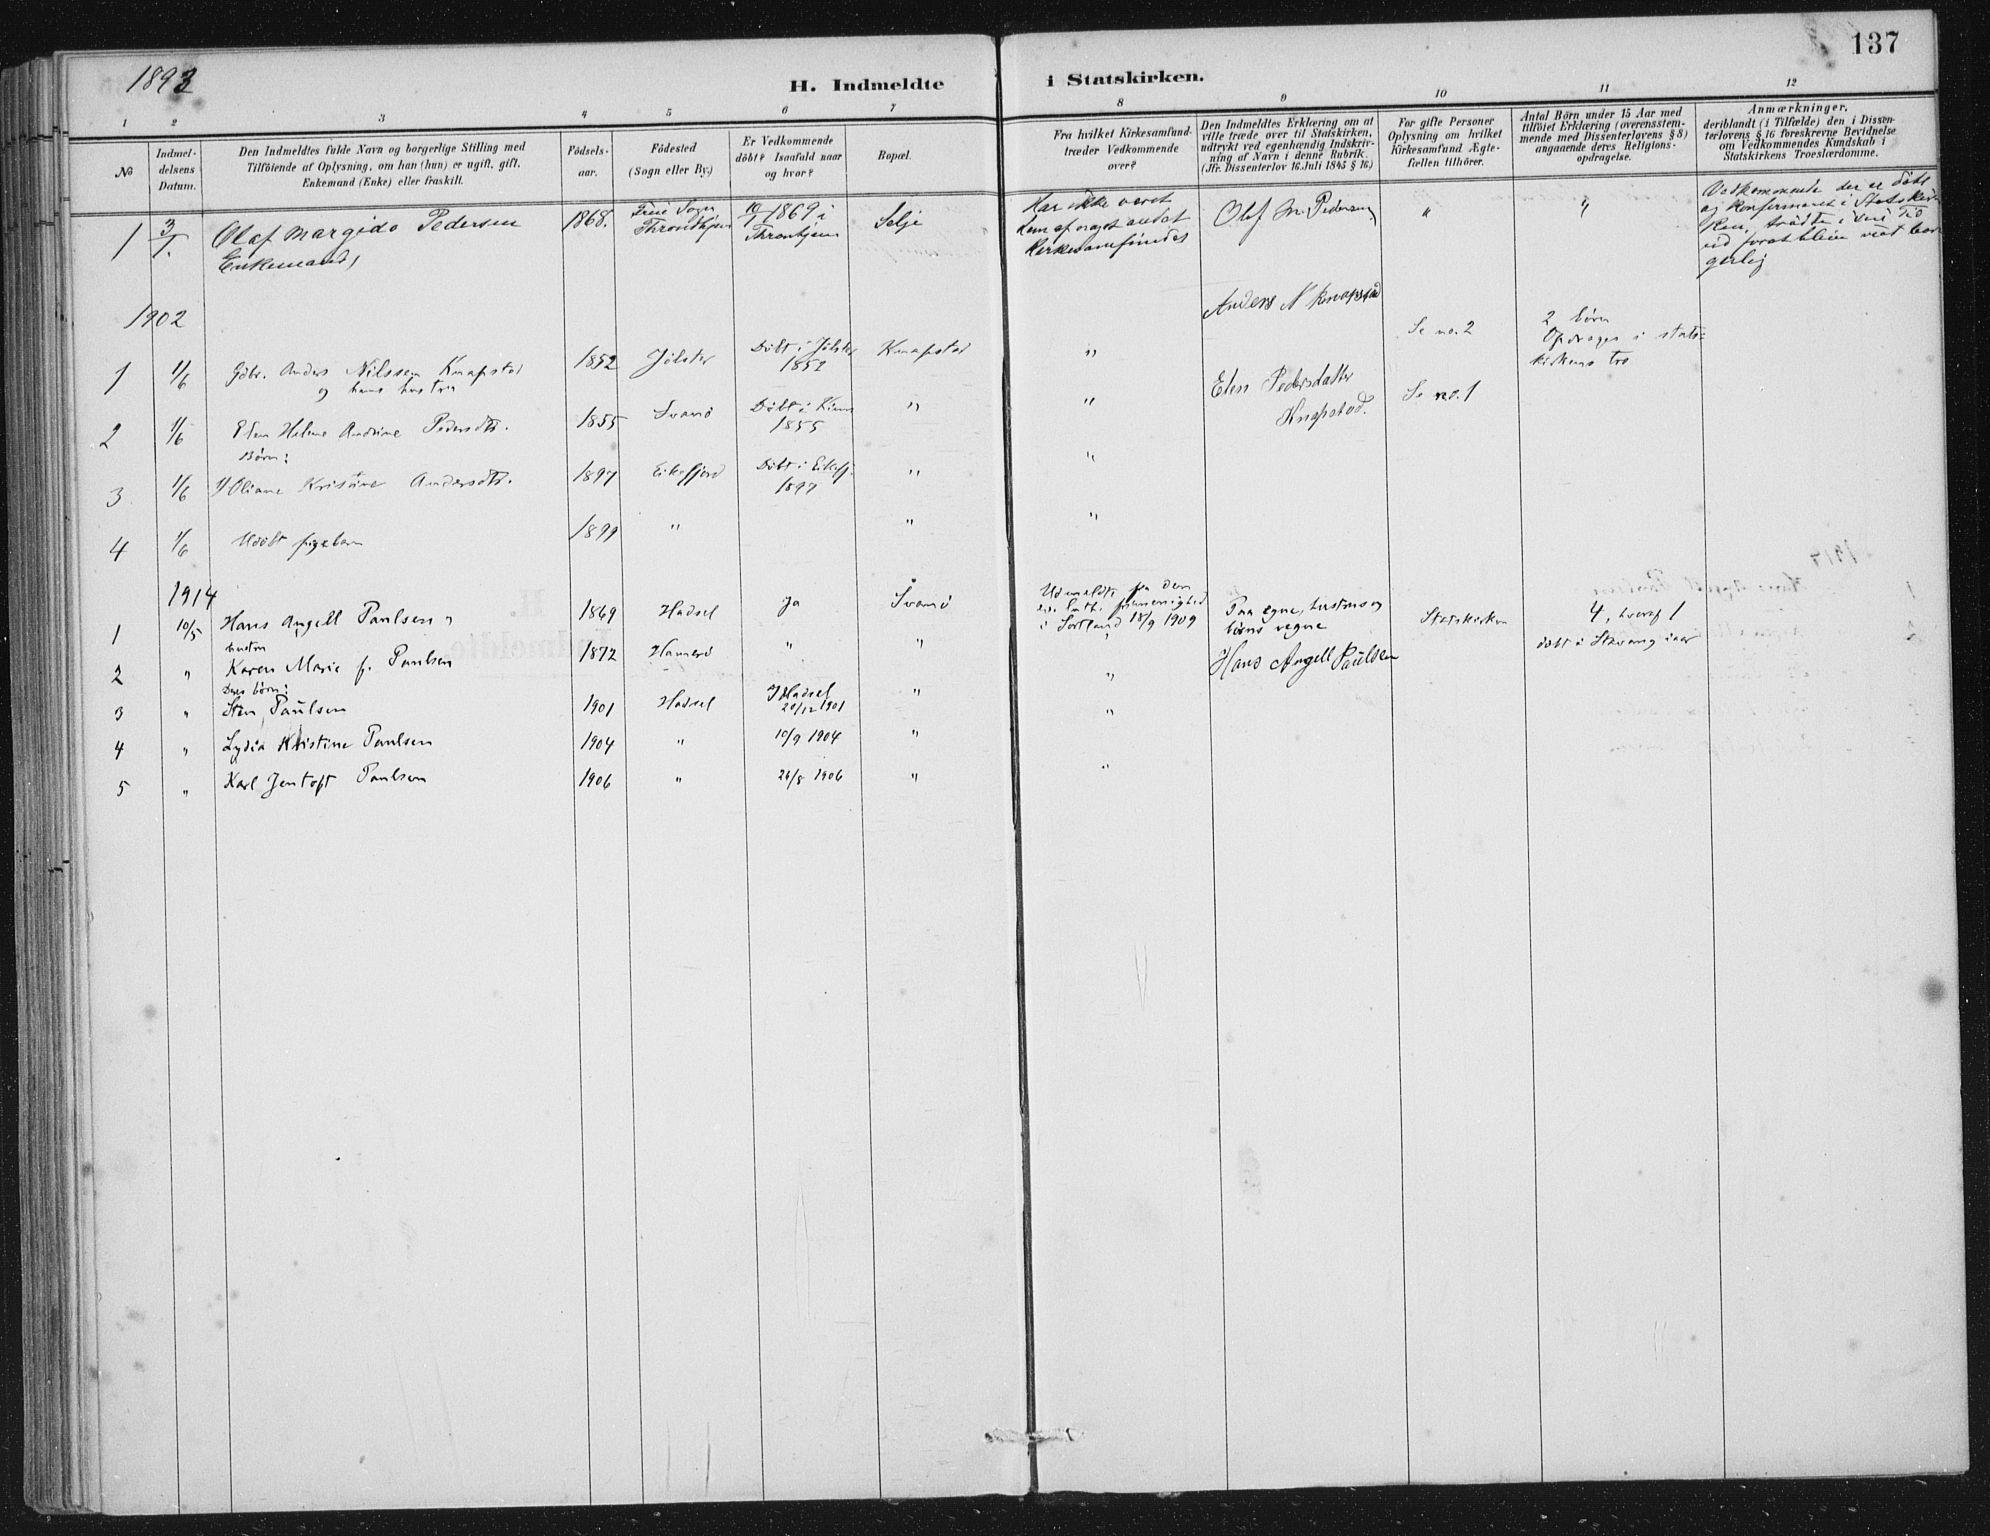 SAB, Kinn sokneprestembete, H/Haa/Haae/L0001: Ministerialbok nr. E 1, 1890-1916, s. 137